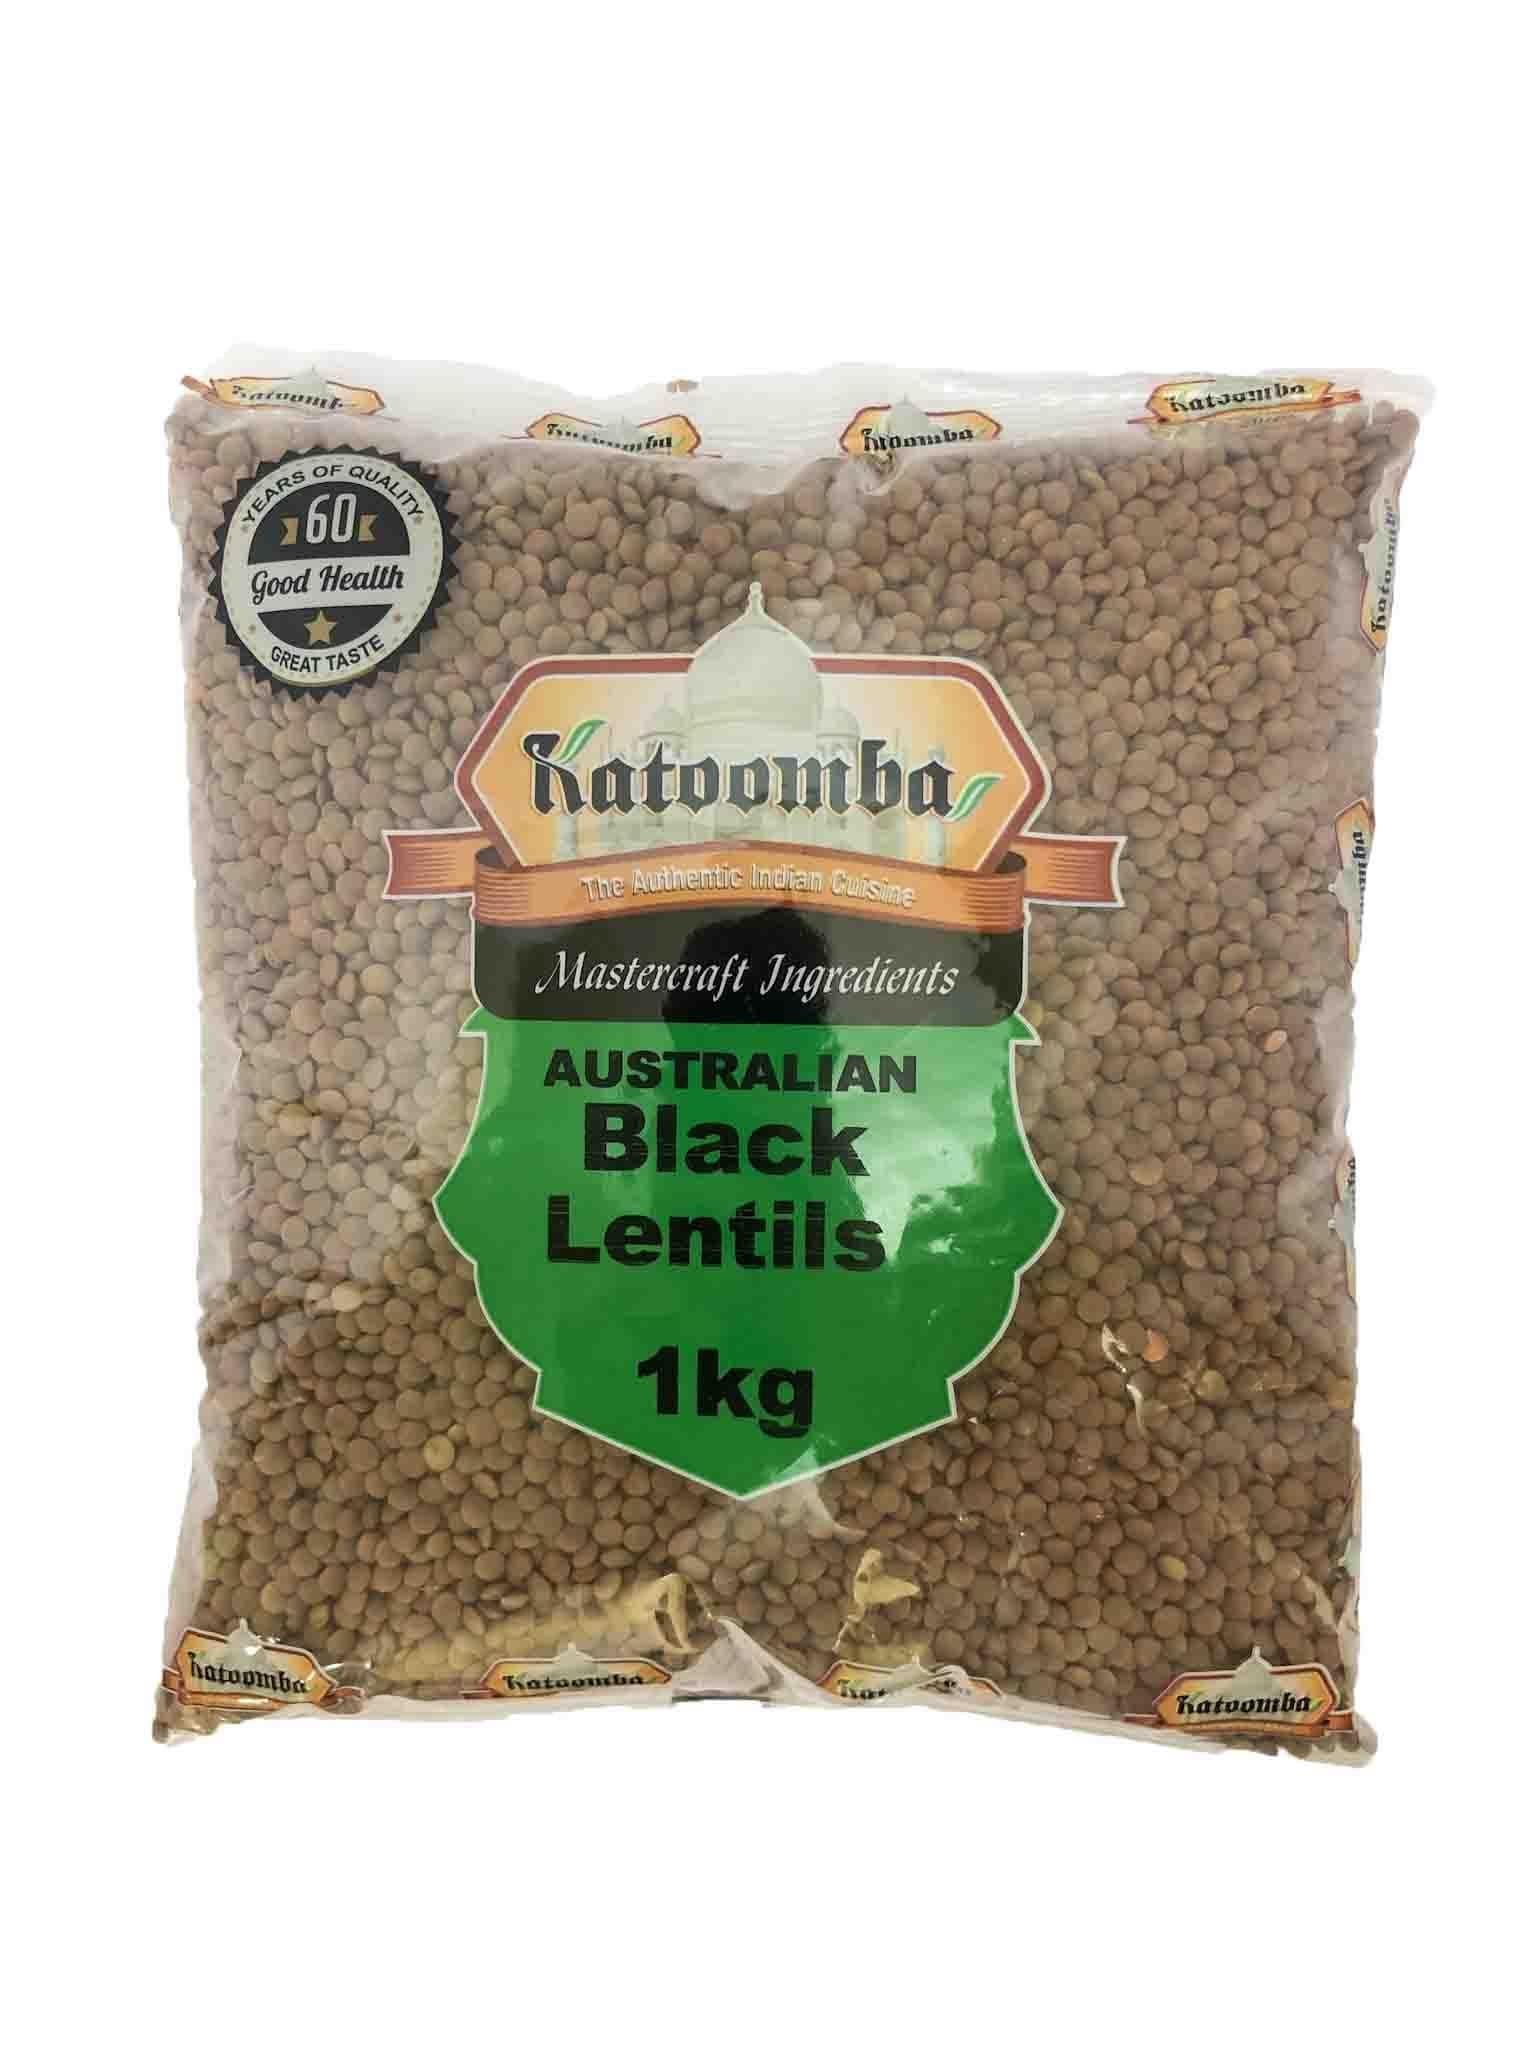 Black Lentils 1Kg By Katoomba Brand